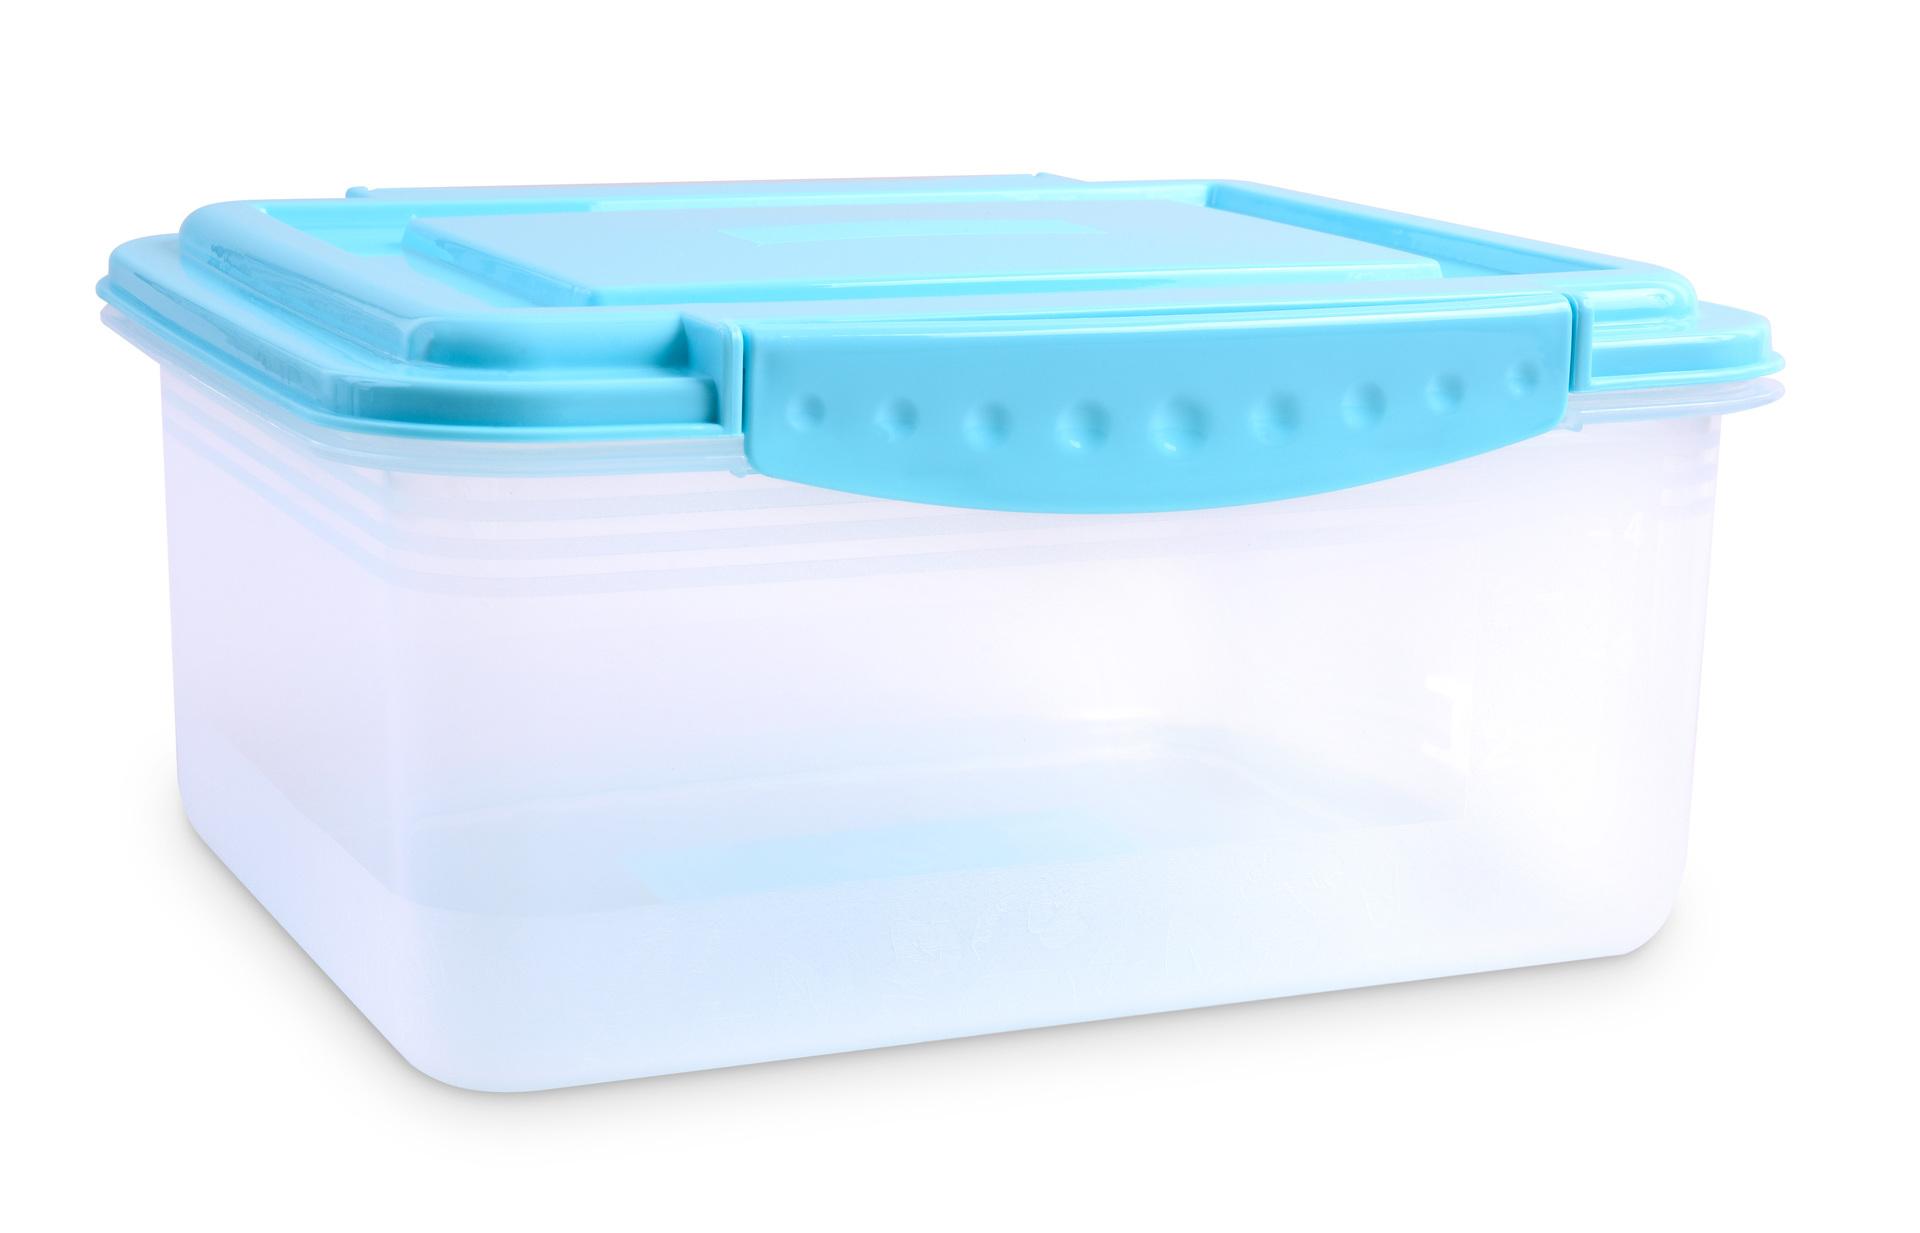 DA16641-CHLADNIČKOBOX na potraviny cca 4000 ml